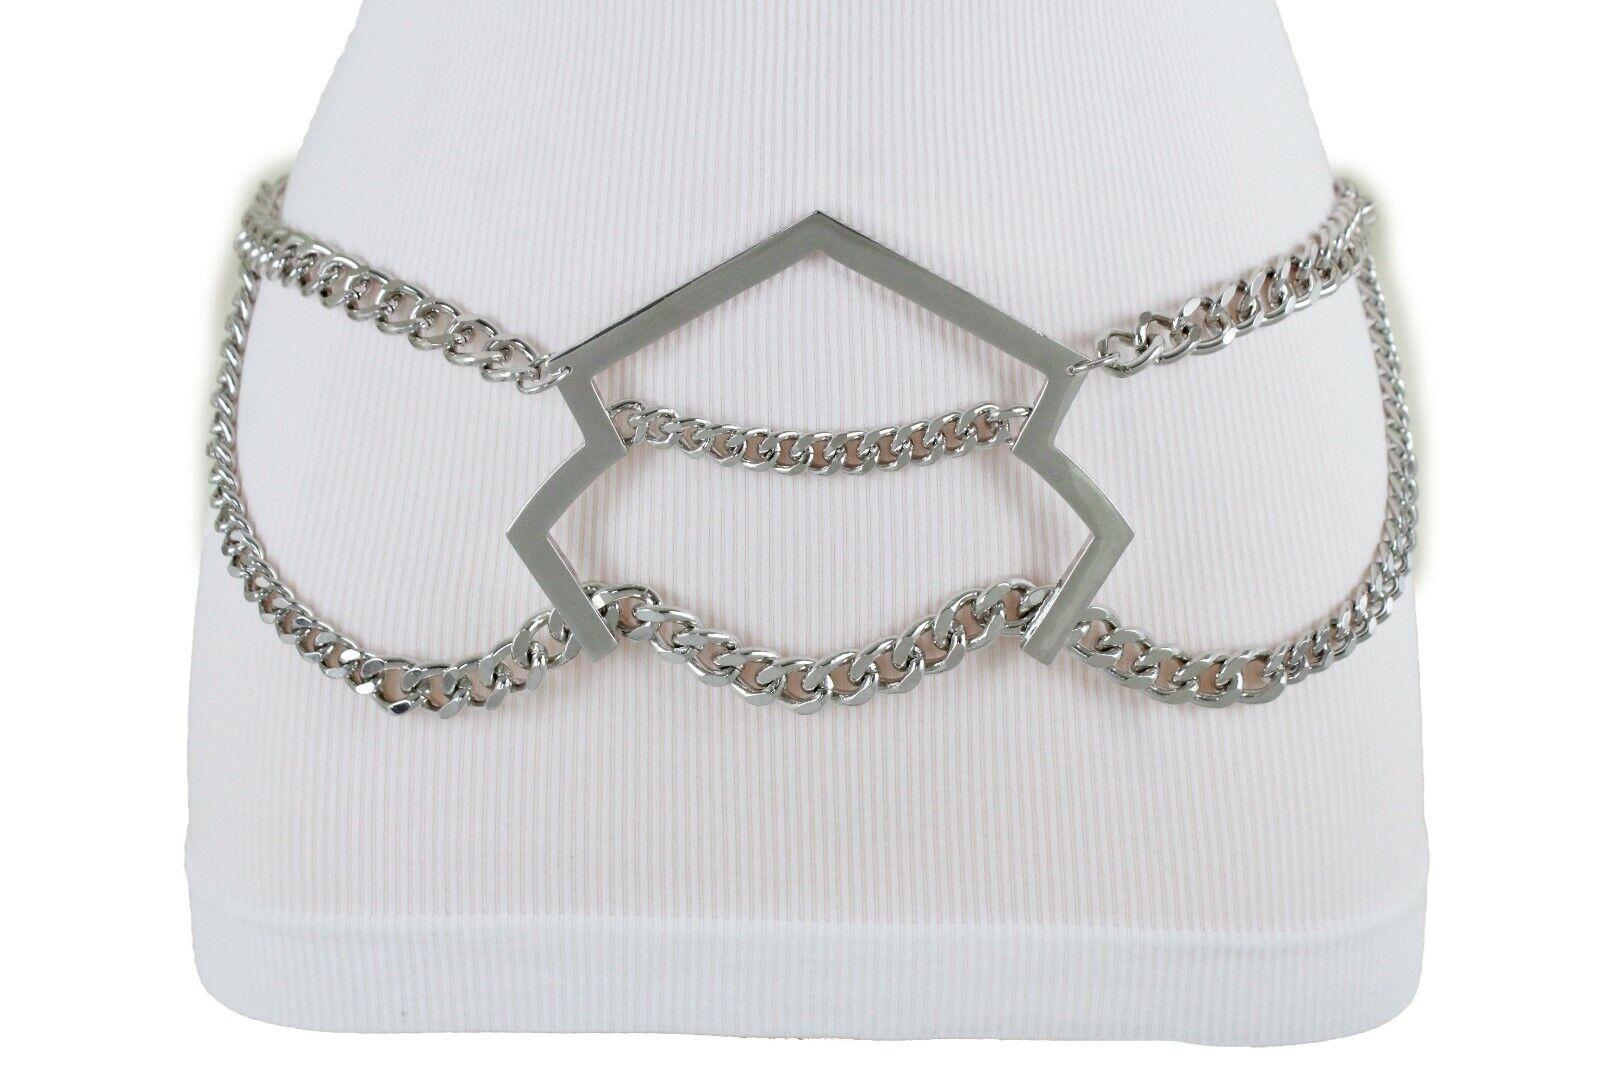 Women Silver Metal Chain Bulky Arrow Charm Buckle Going Out Fashion Belt M L XL